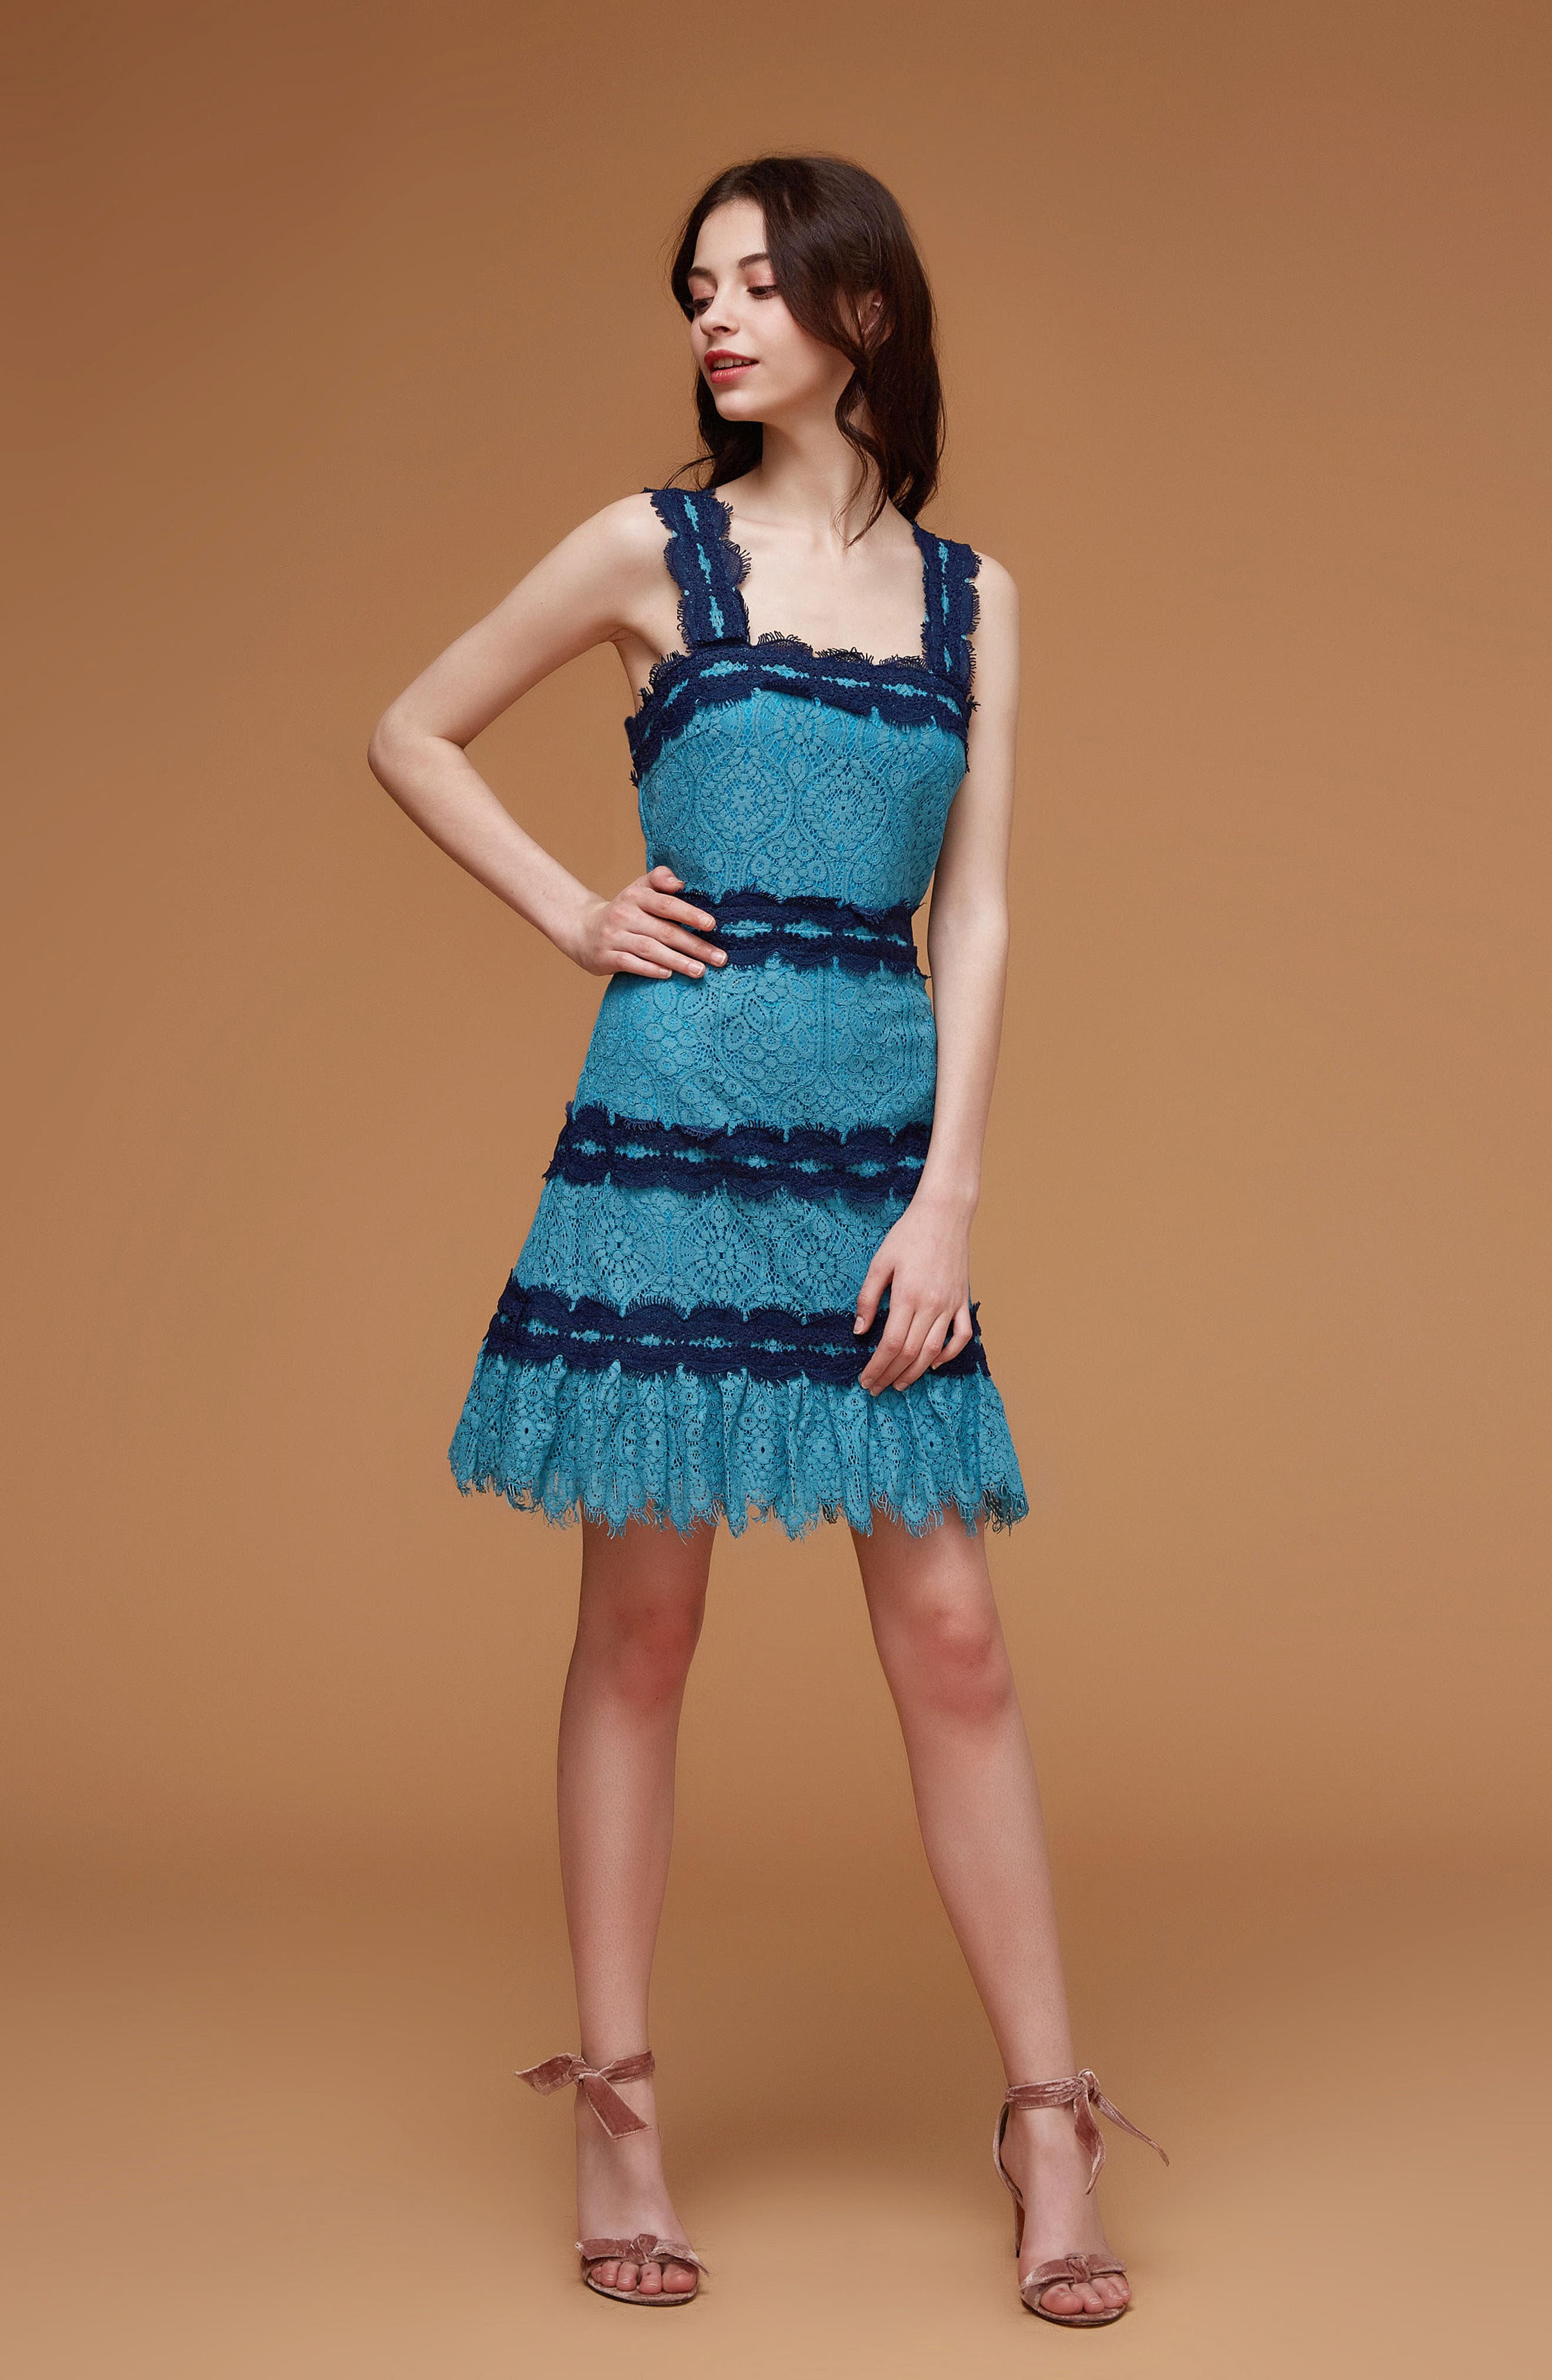 Lula Ruffle Lace Dress,                             Alternate thumbnail 8, color,                             TEAL/ NAVY